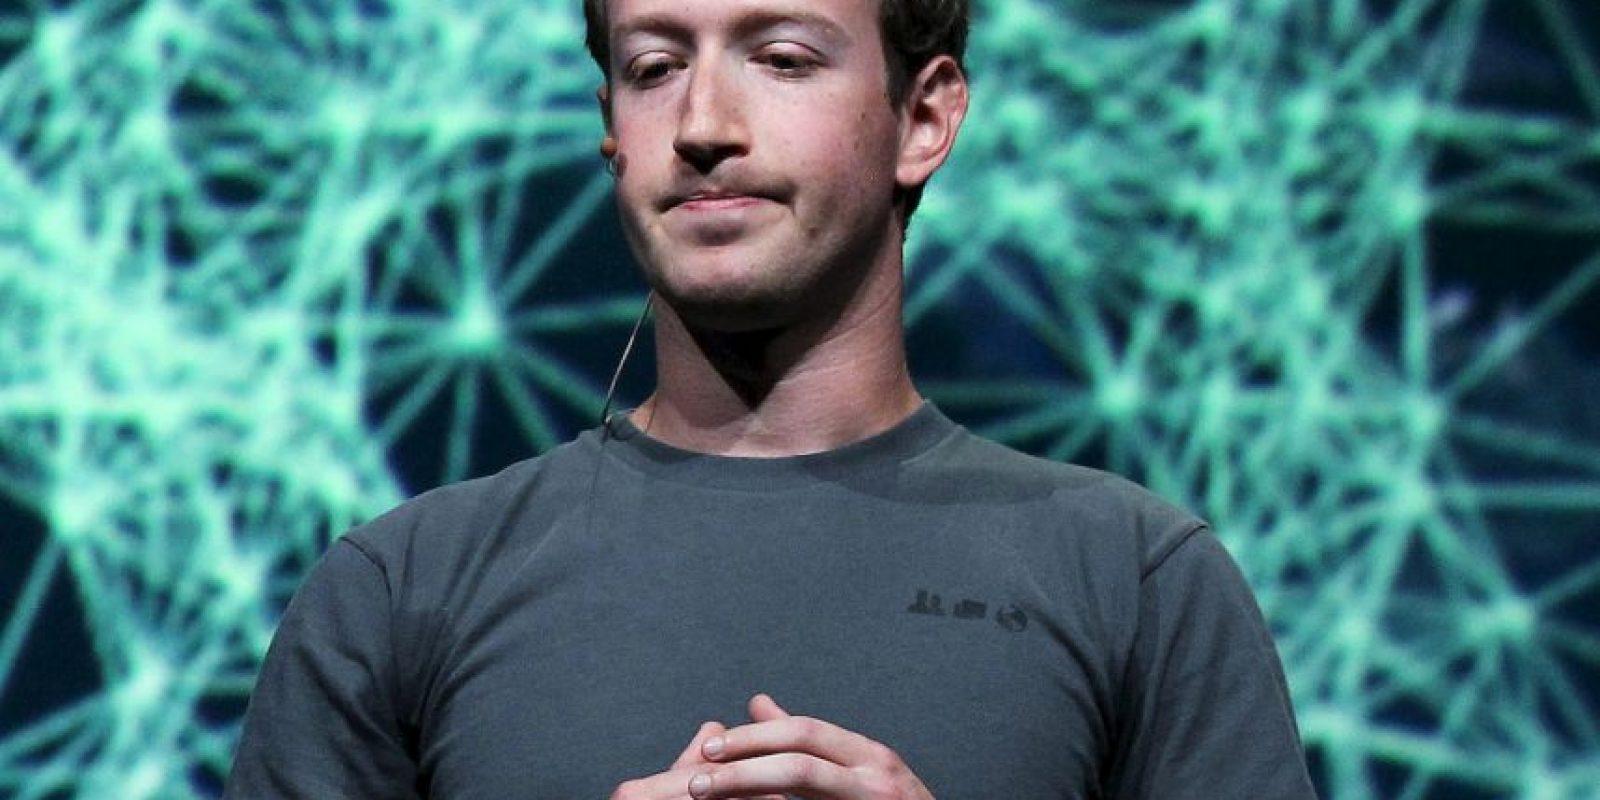 La F8 fue muy productiva para Mark Zuckerberg Foto:Getty